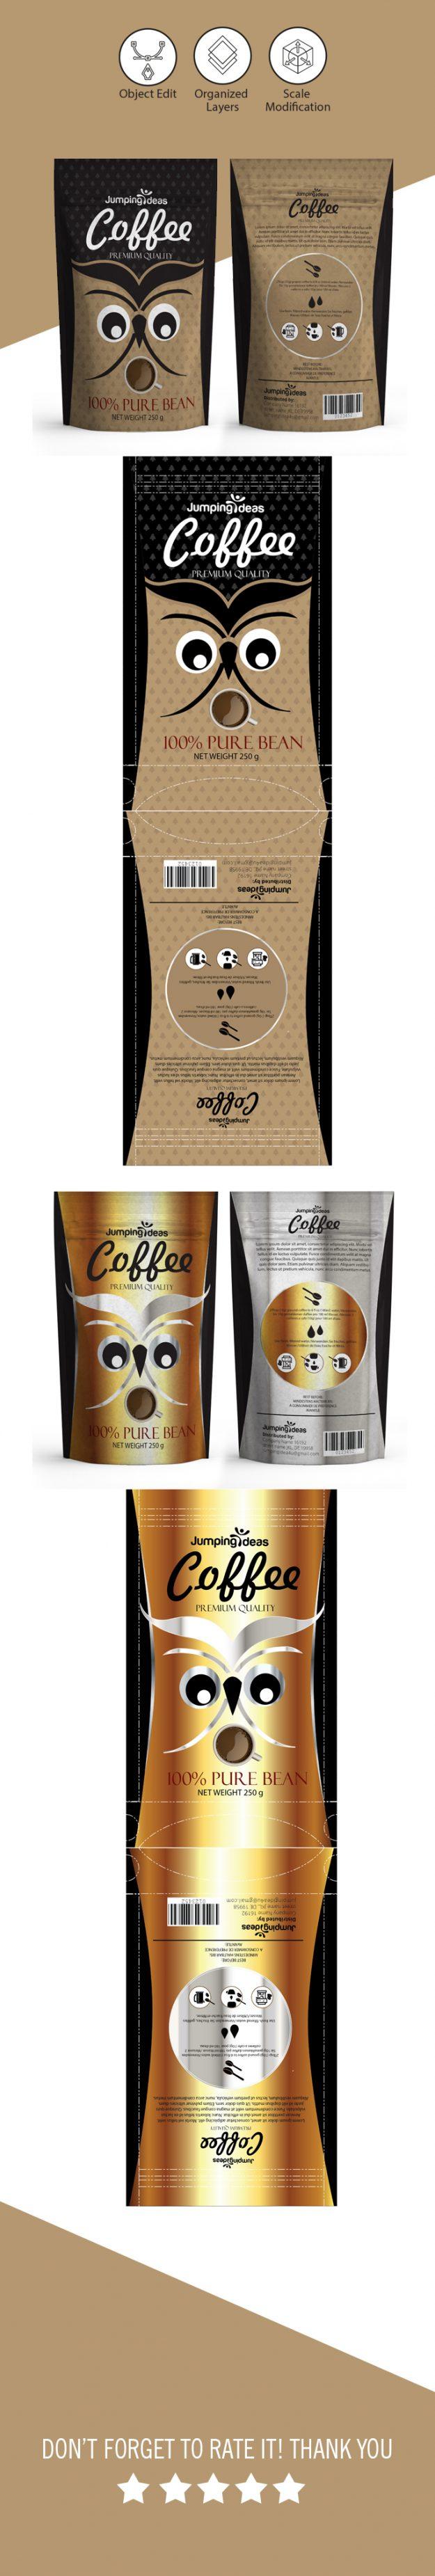 coffee bag template packaging seller. Black Bedroom Furniture Sets. Home Design Ideas